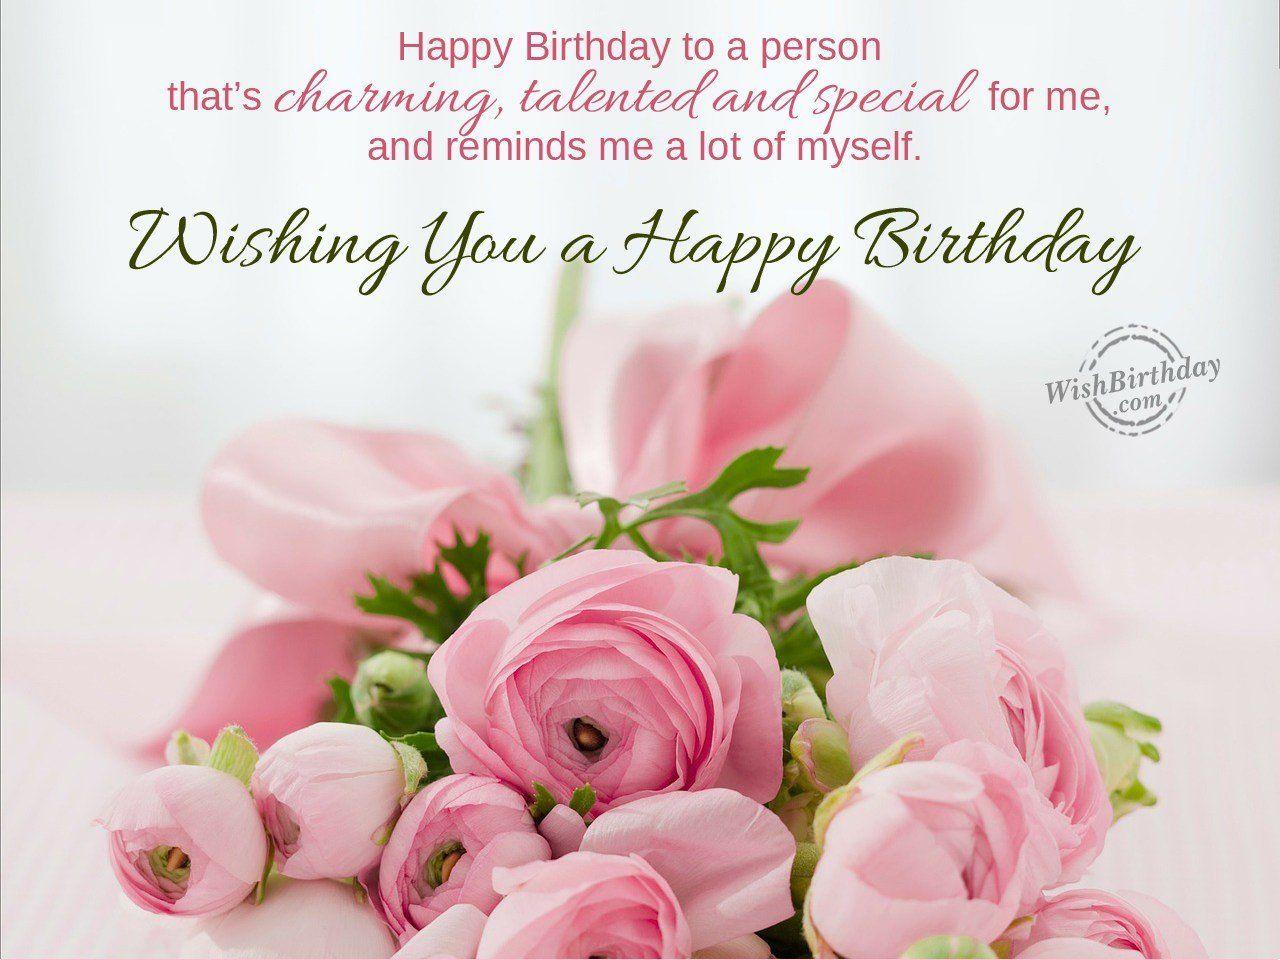 Cool Good Looking Wife Happy Happy Birthday Blessings Son Happy Birthday Blessings Quotes Good Looking Wife Happy Birthday Religious Wishes Happy Birthday Religious Wishes